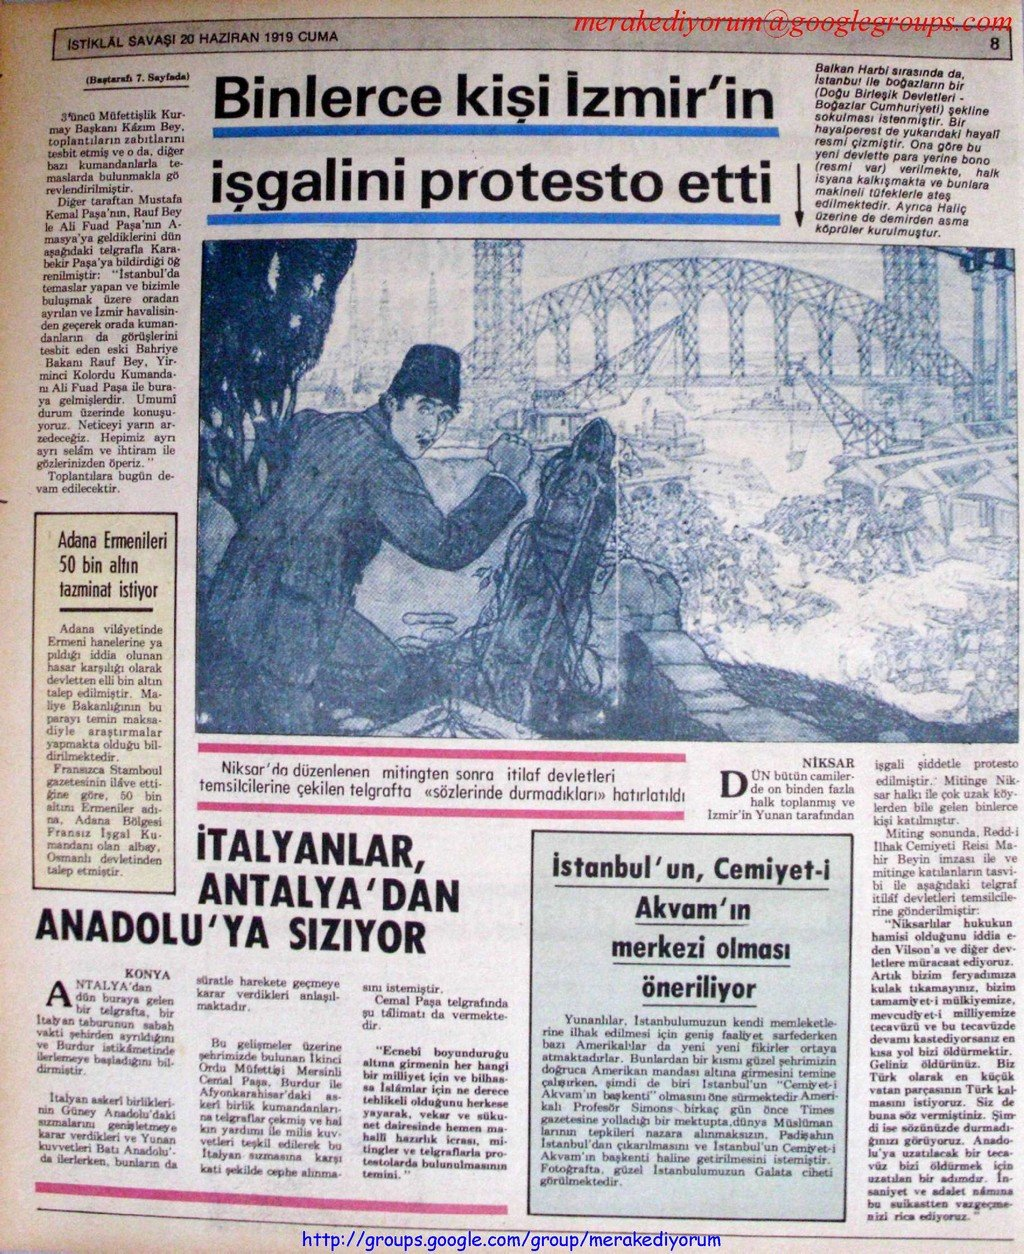 istiklal savaşı gazetesi - 20 haziran 1919